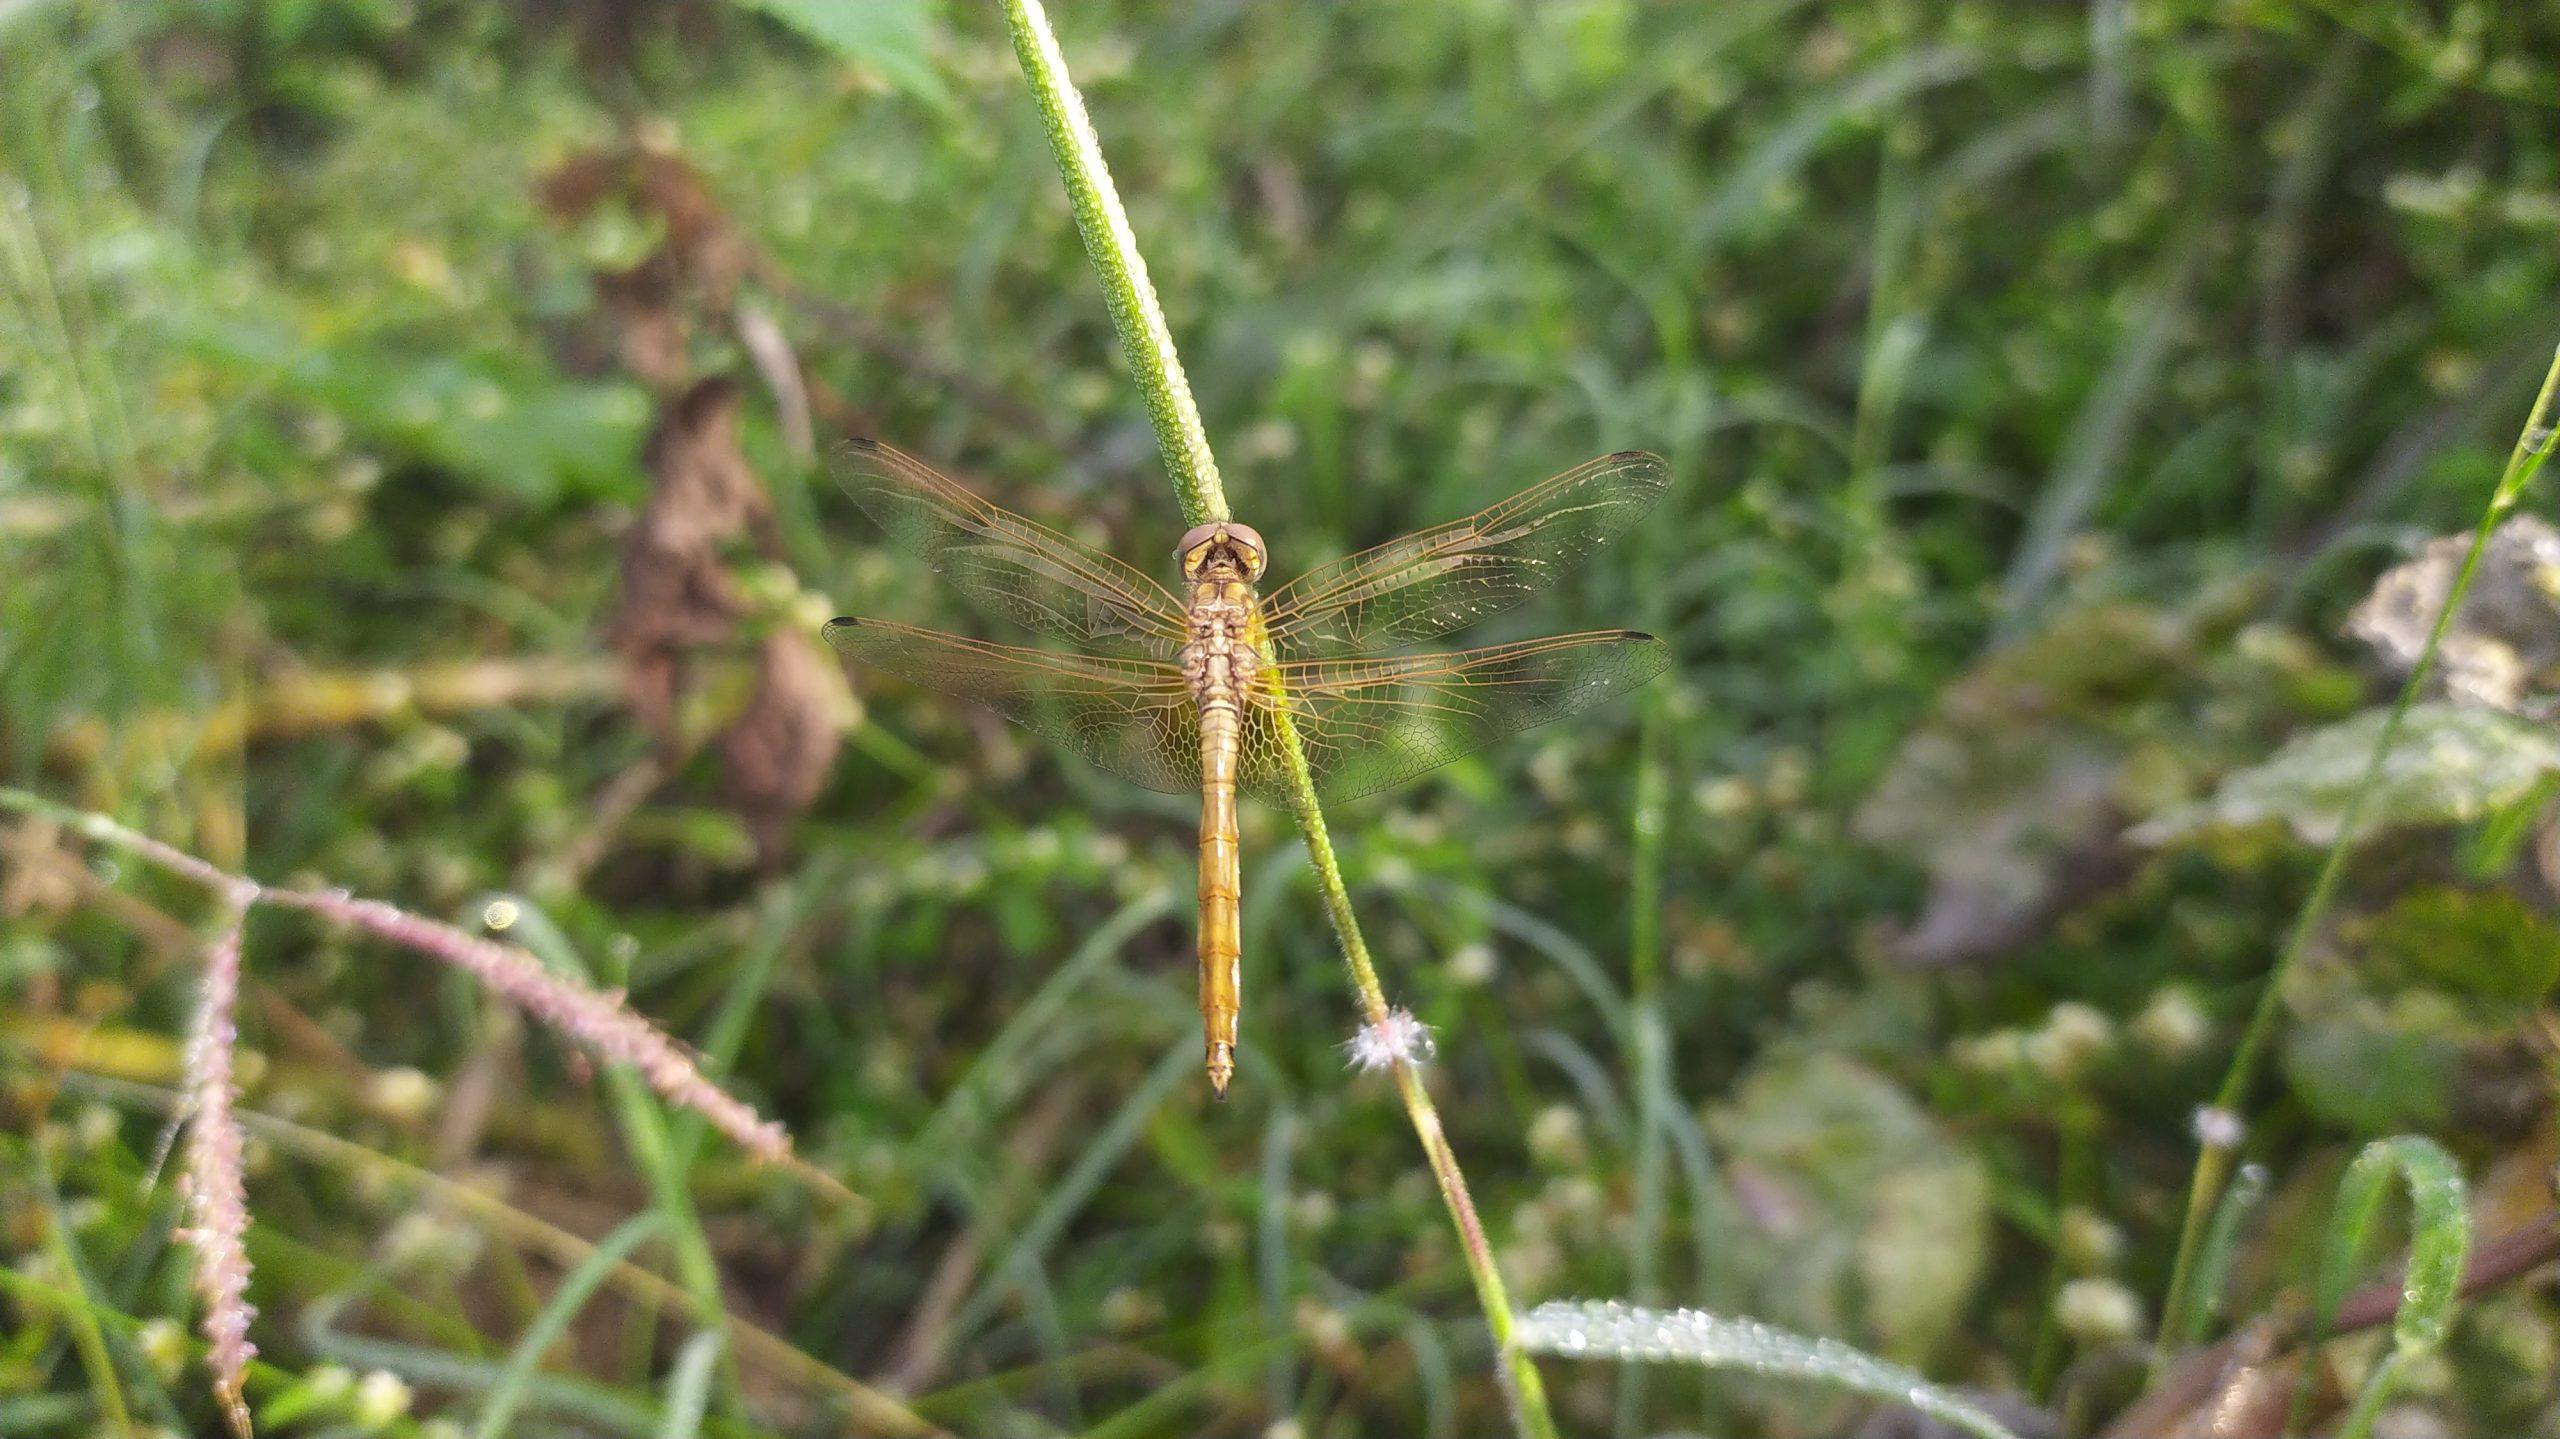 A dragonfly on stem